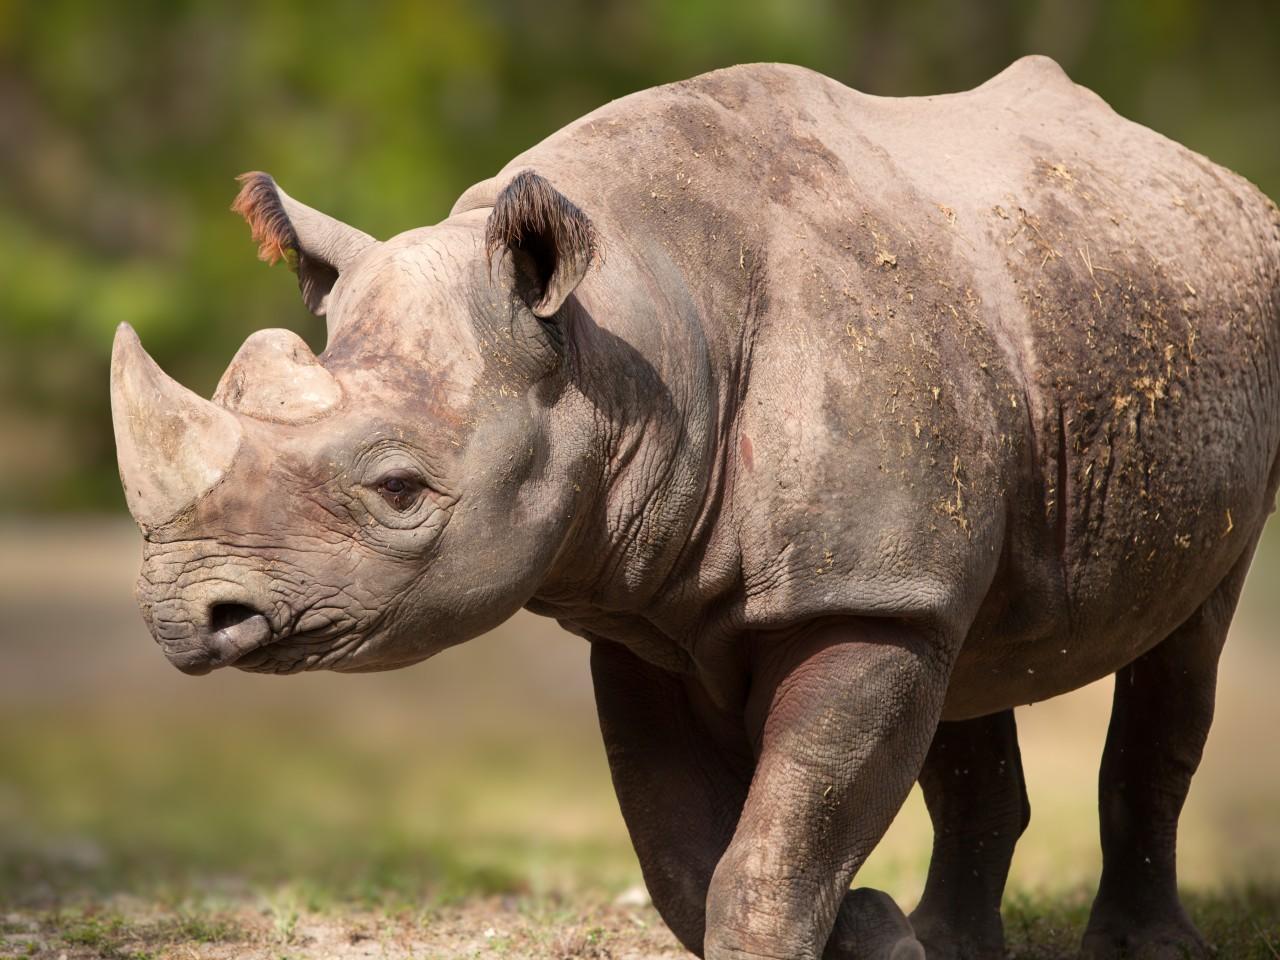 Save the rhino! - Salon.com